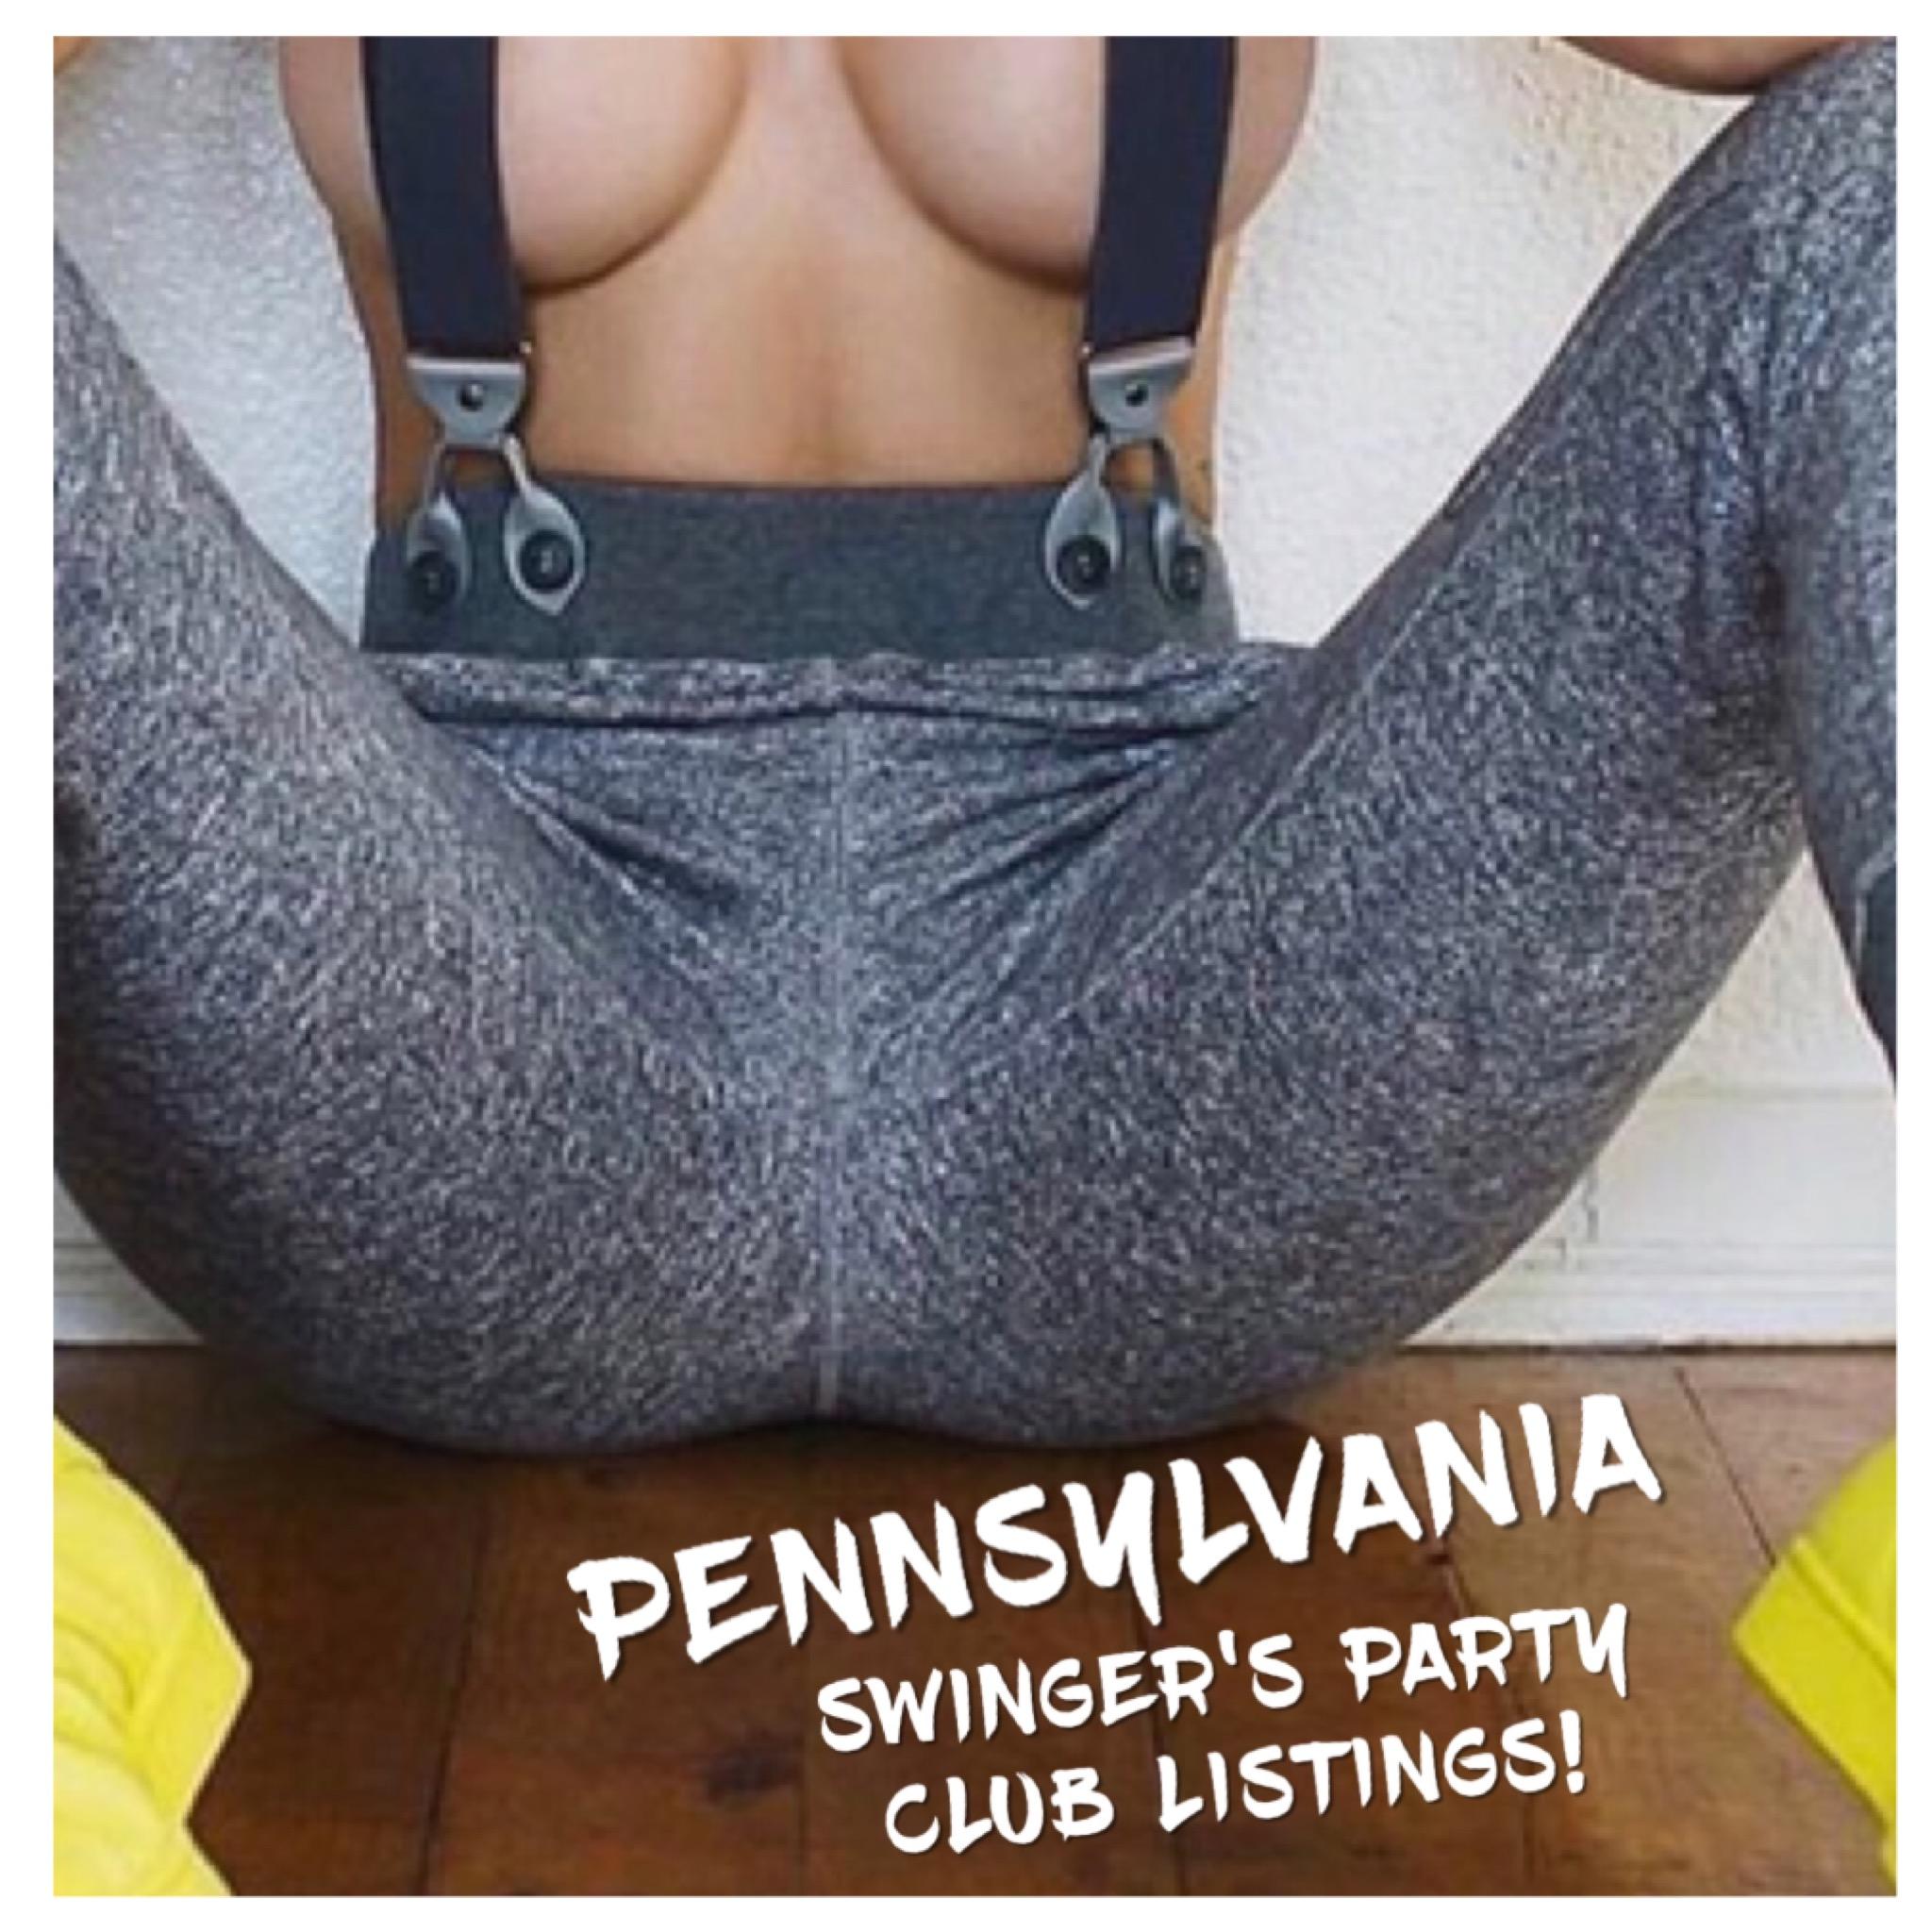 Sex club locations